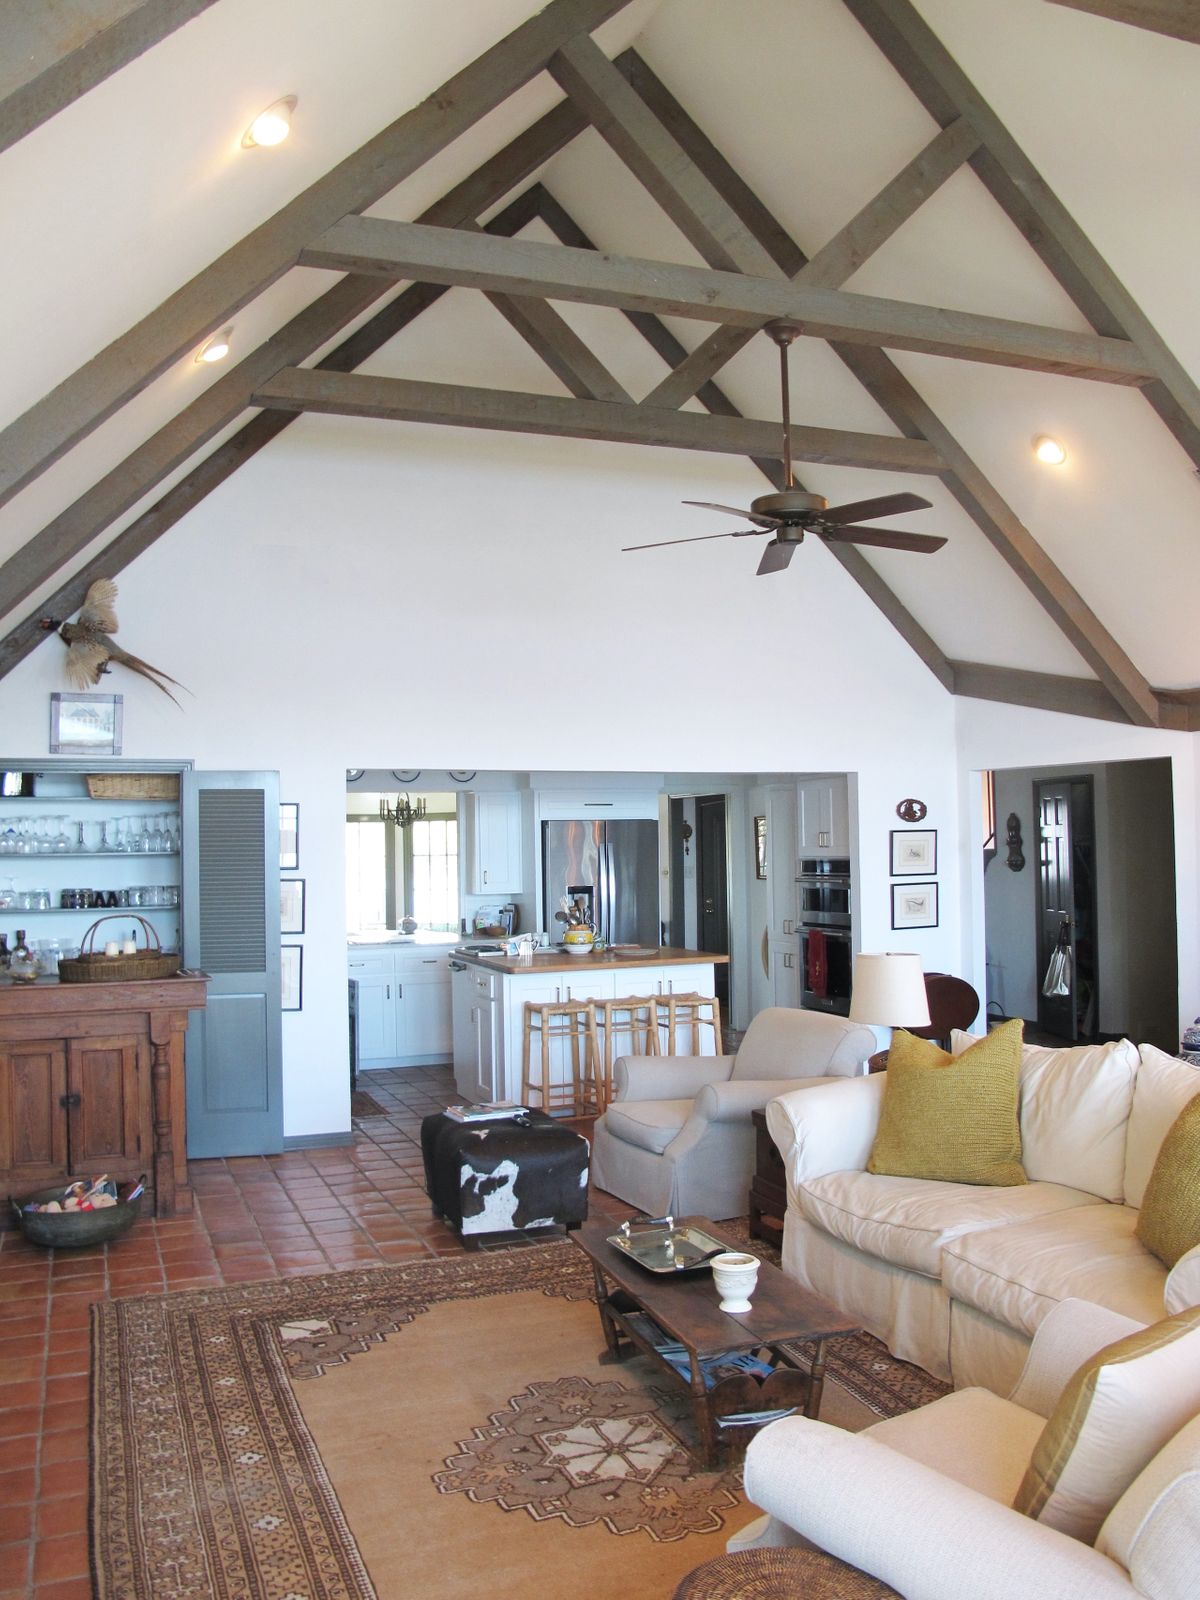 Pola Lakehouse Video Shoot Location Homes Dallas 31.jpg